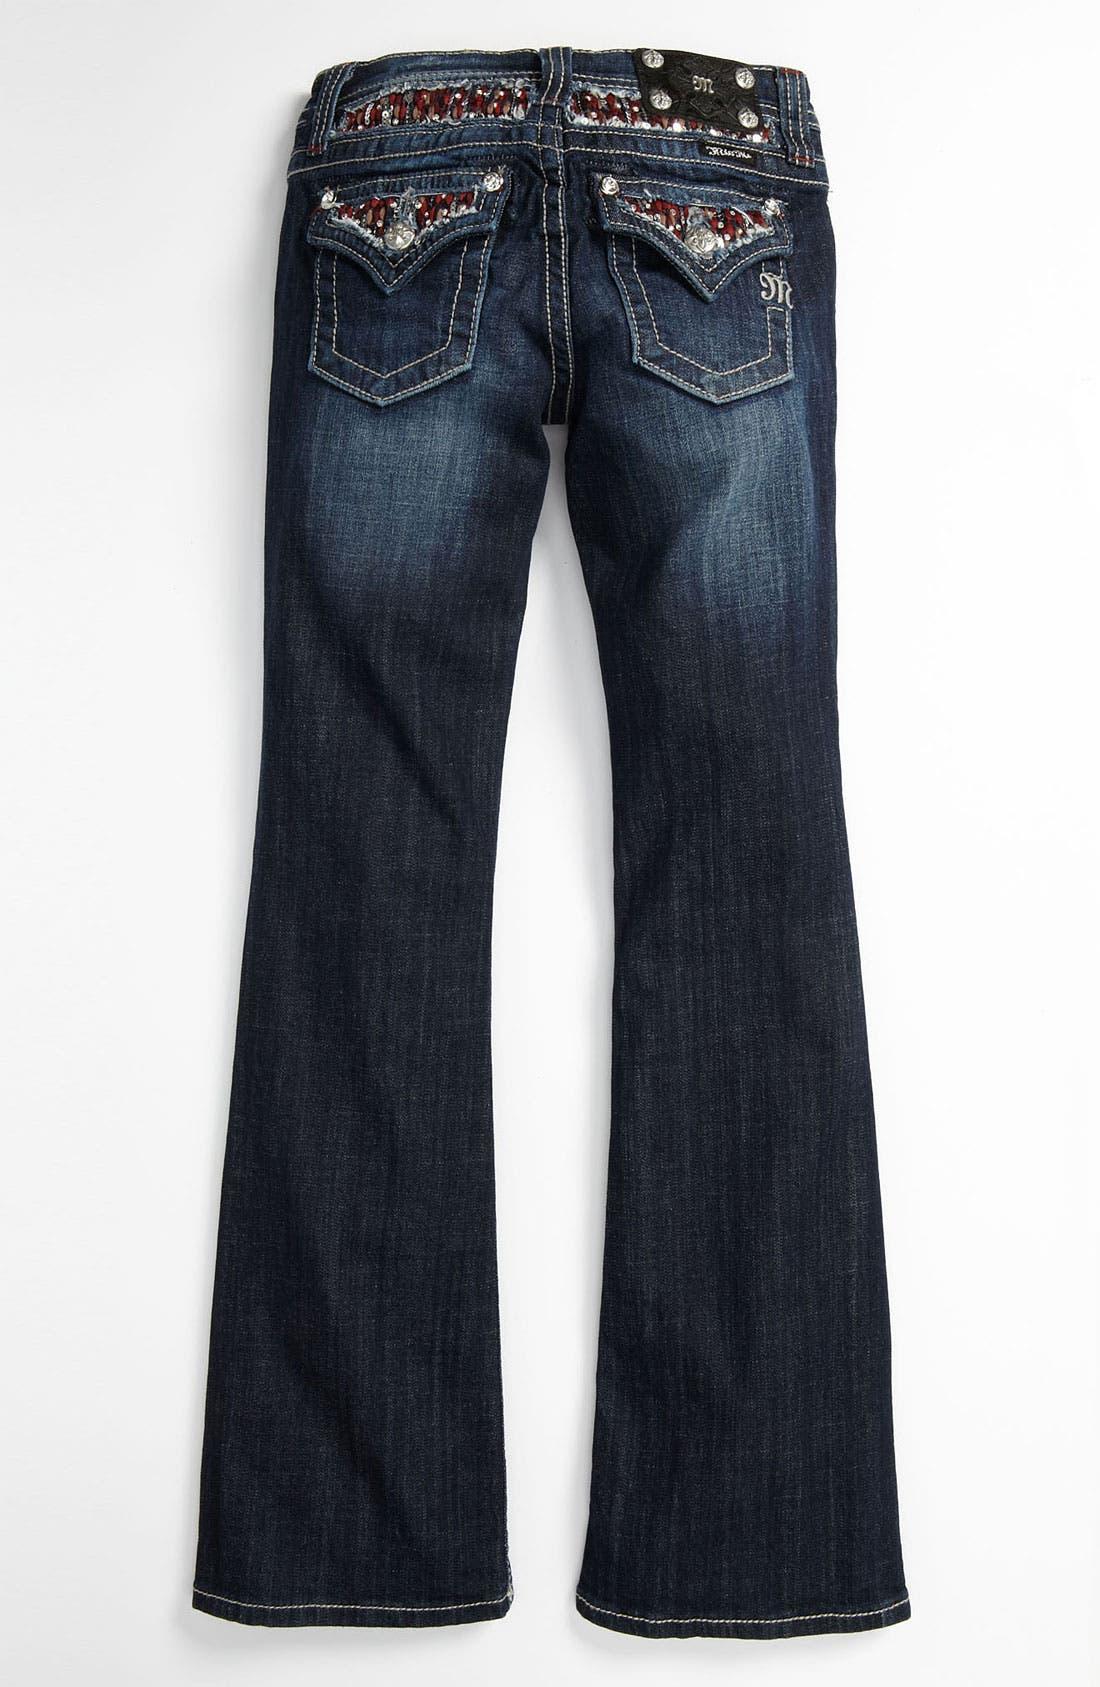 Main Image - Miss Me Embellished Bootcut Jeans (Big Girls)